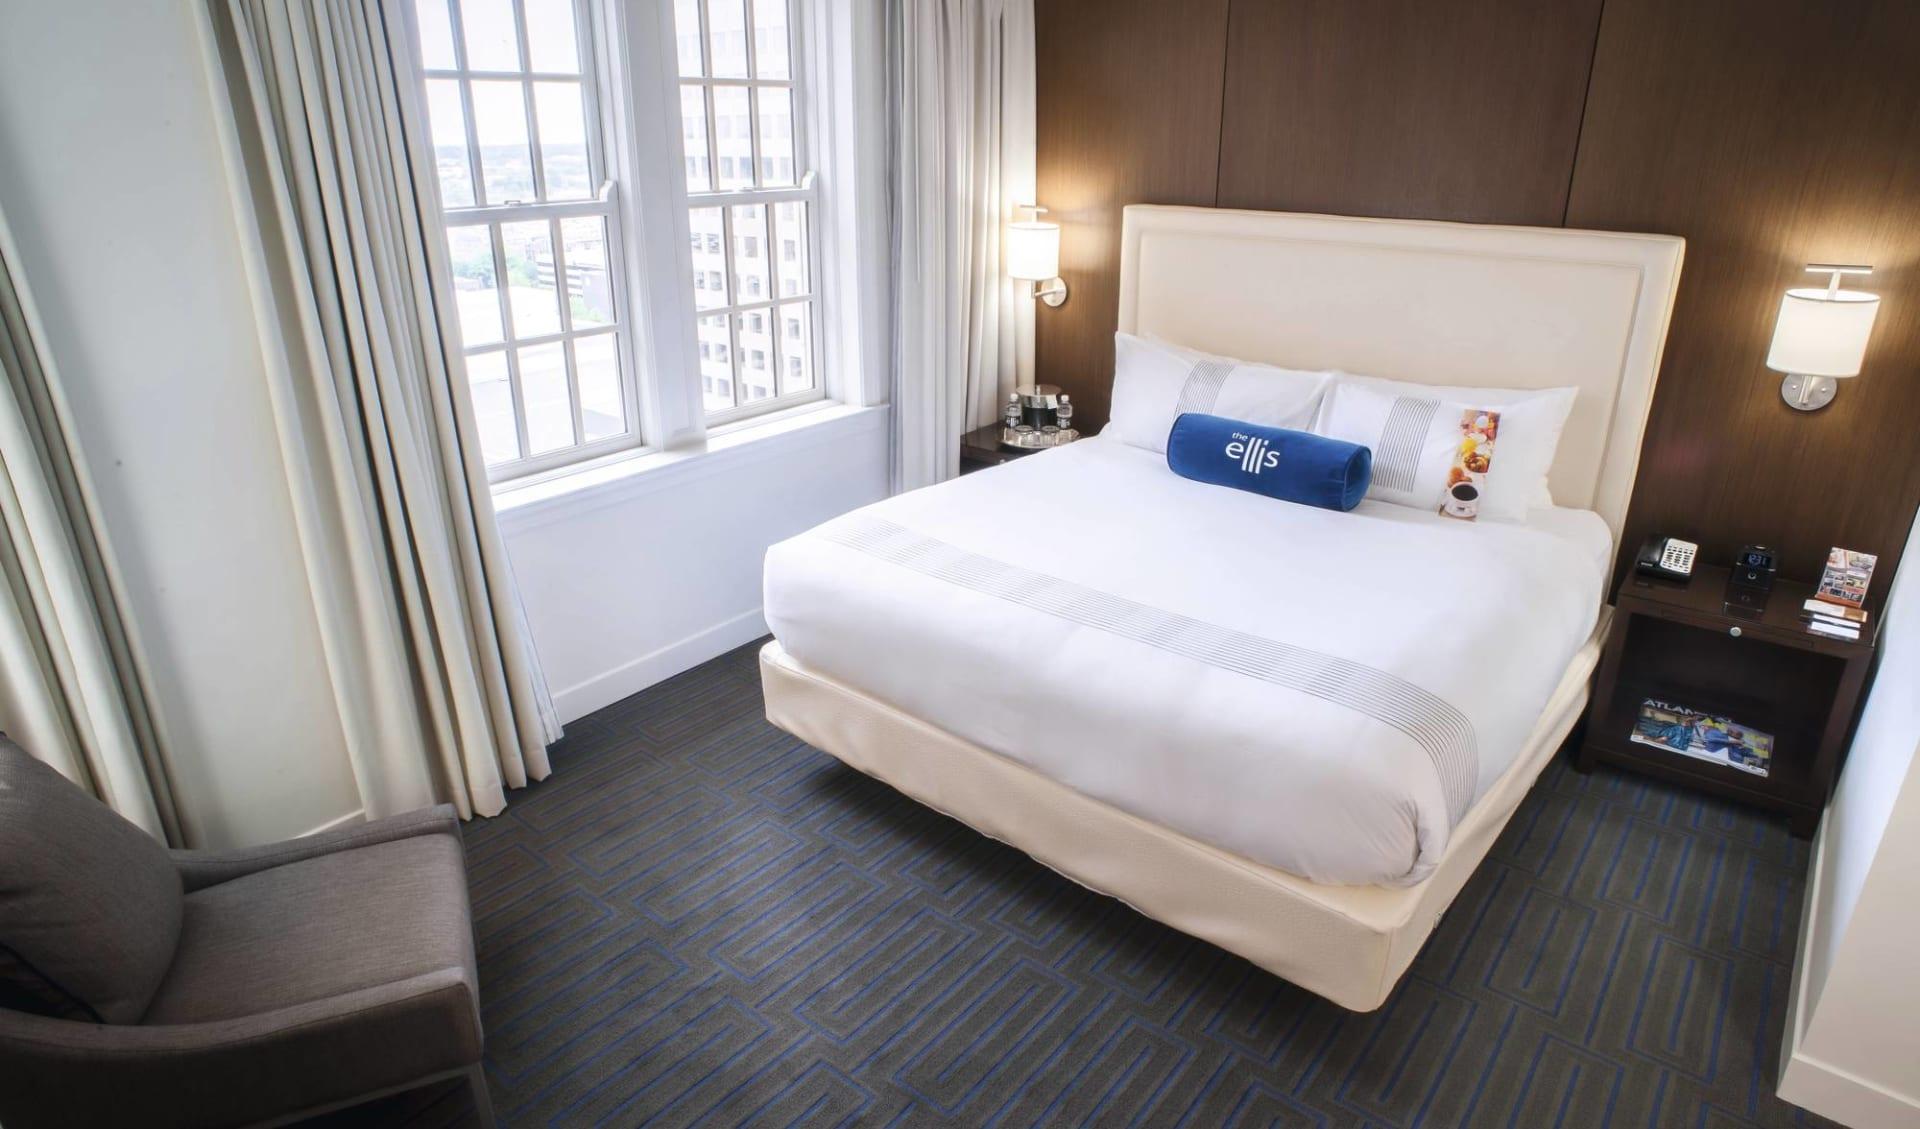 The Ellis Hotel in Atlanta:  Ellis Hotel ATL - Deluxe Room